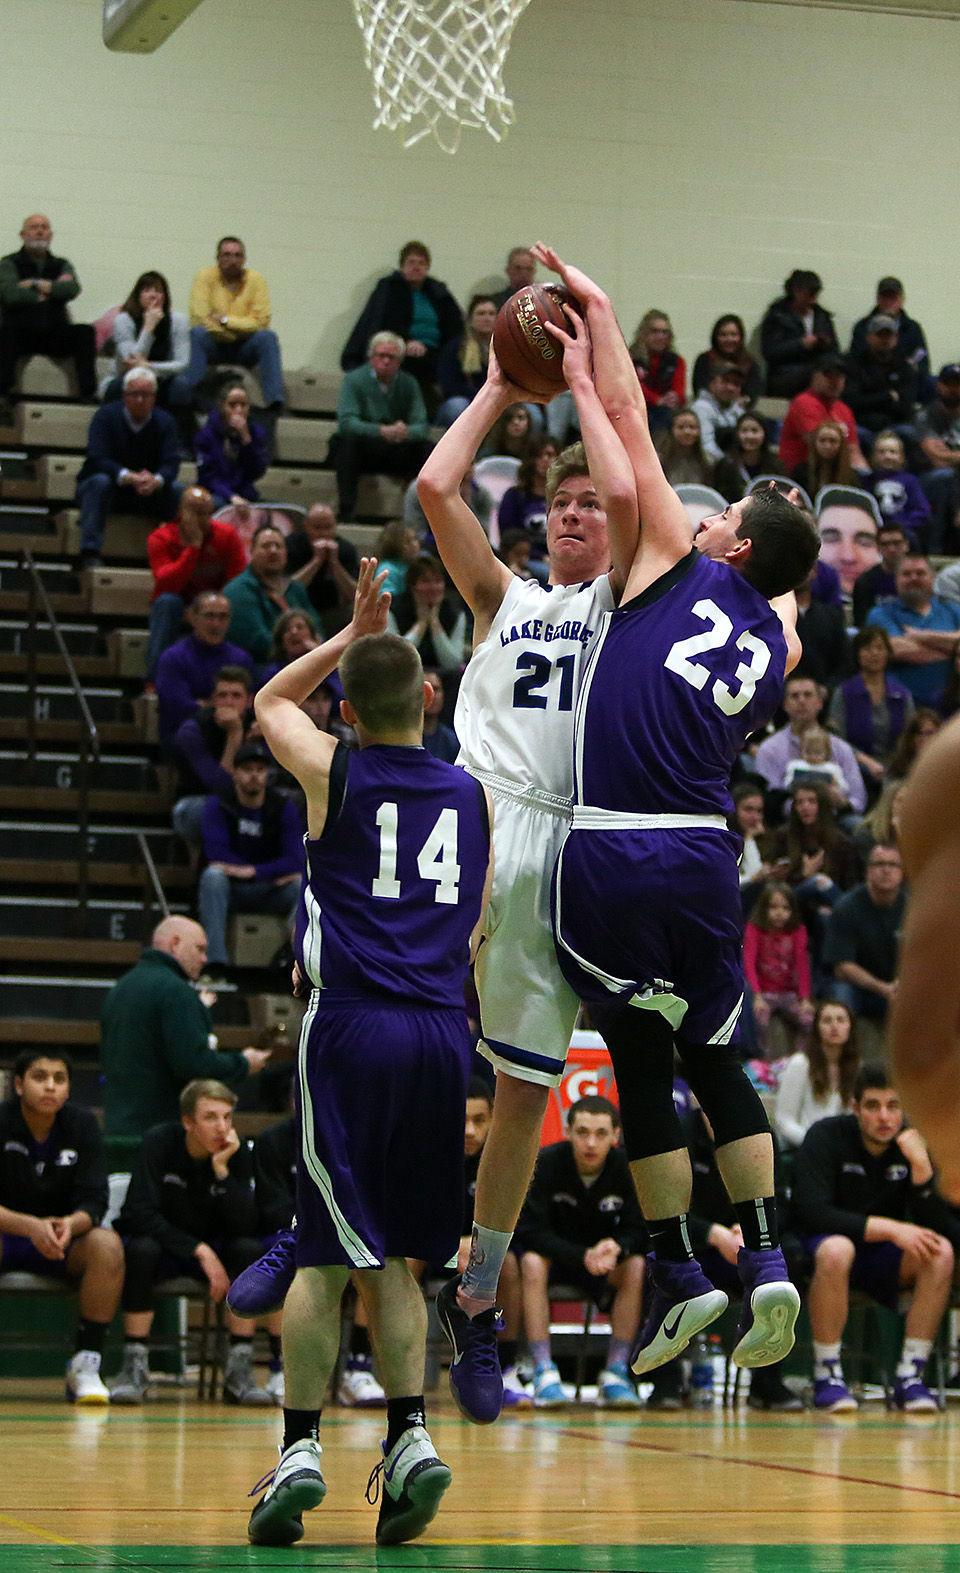 Boys basketball -- Lake George vs. Ticonderoga